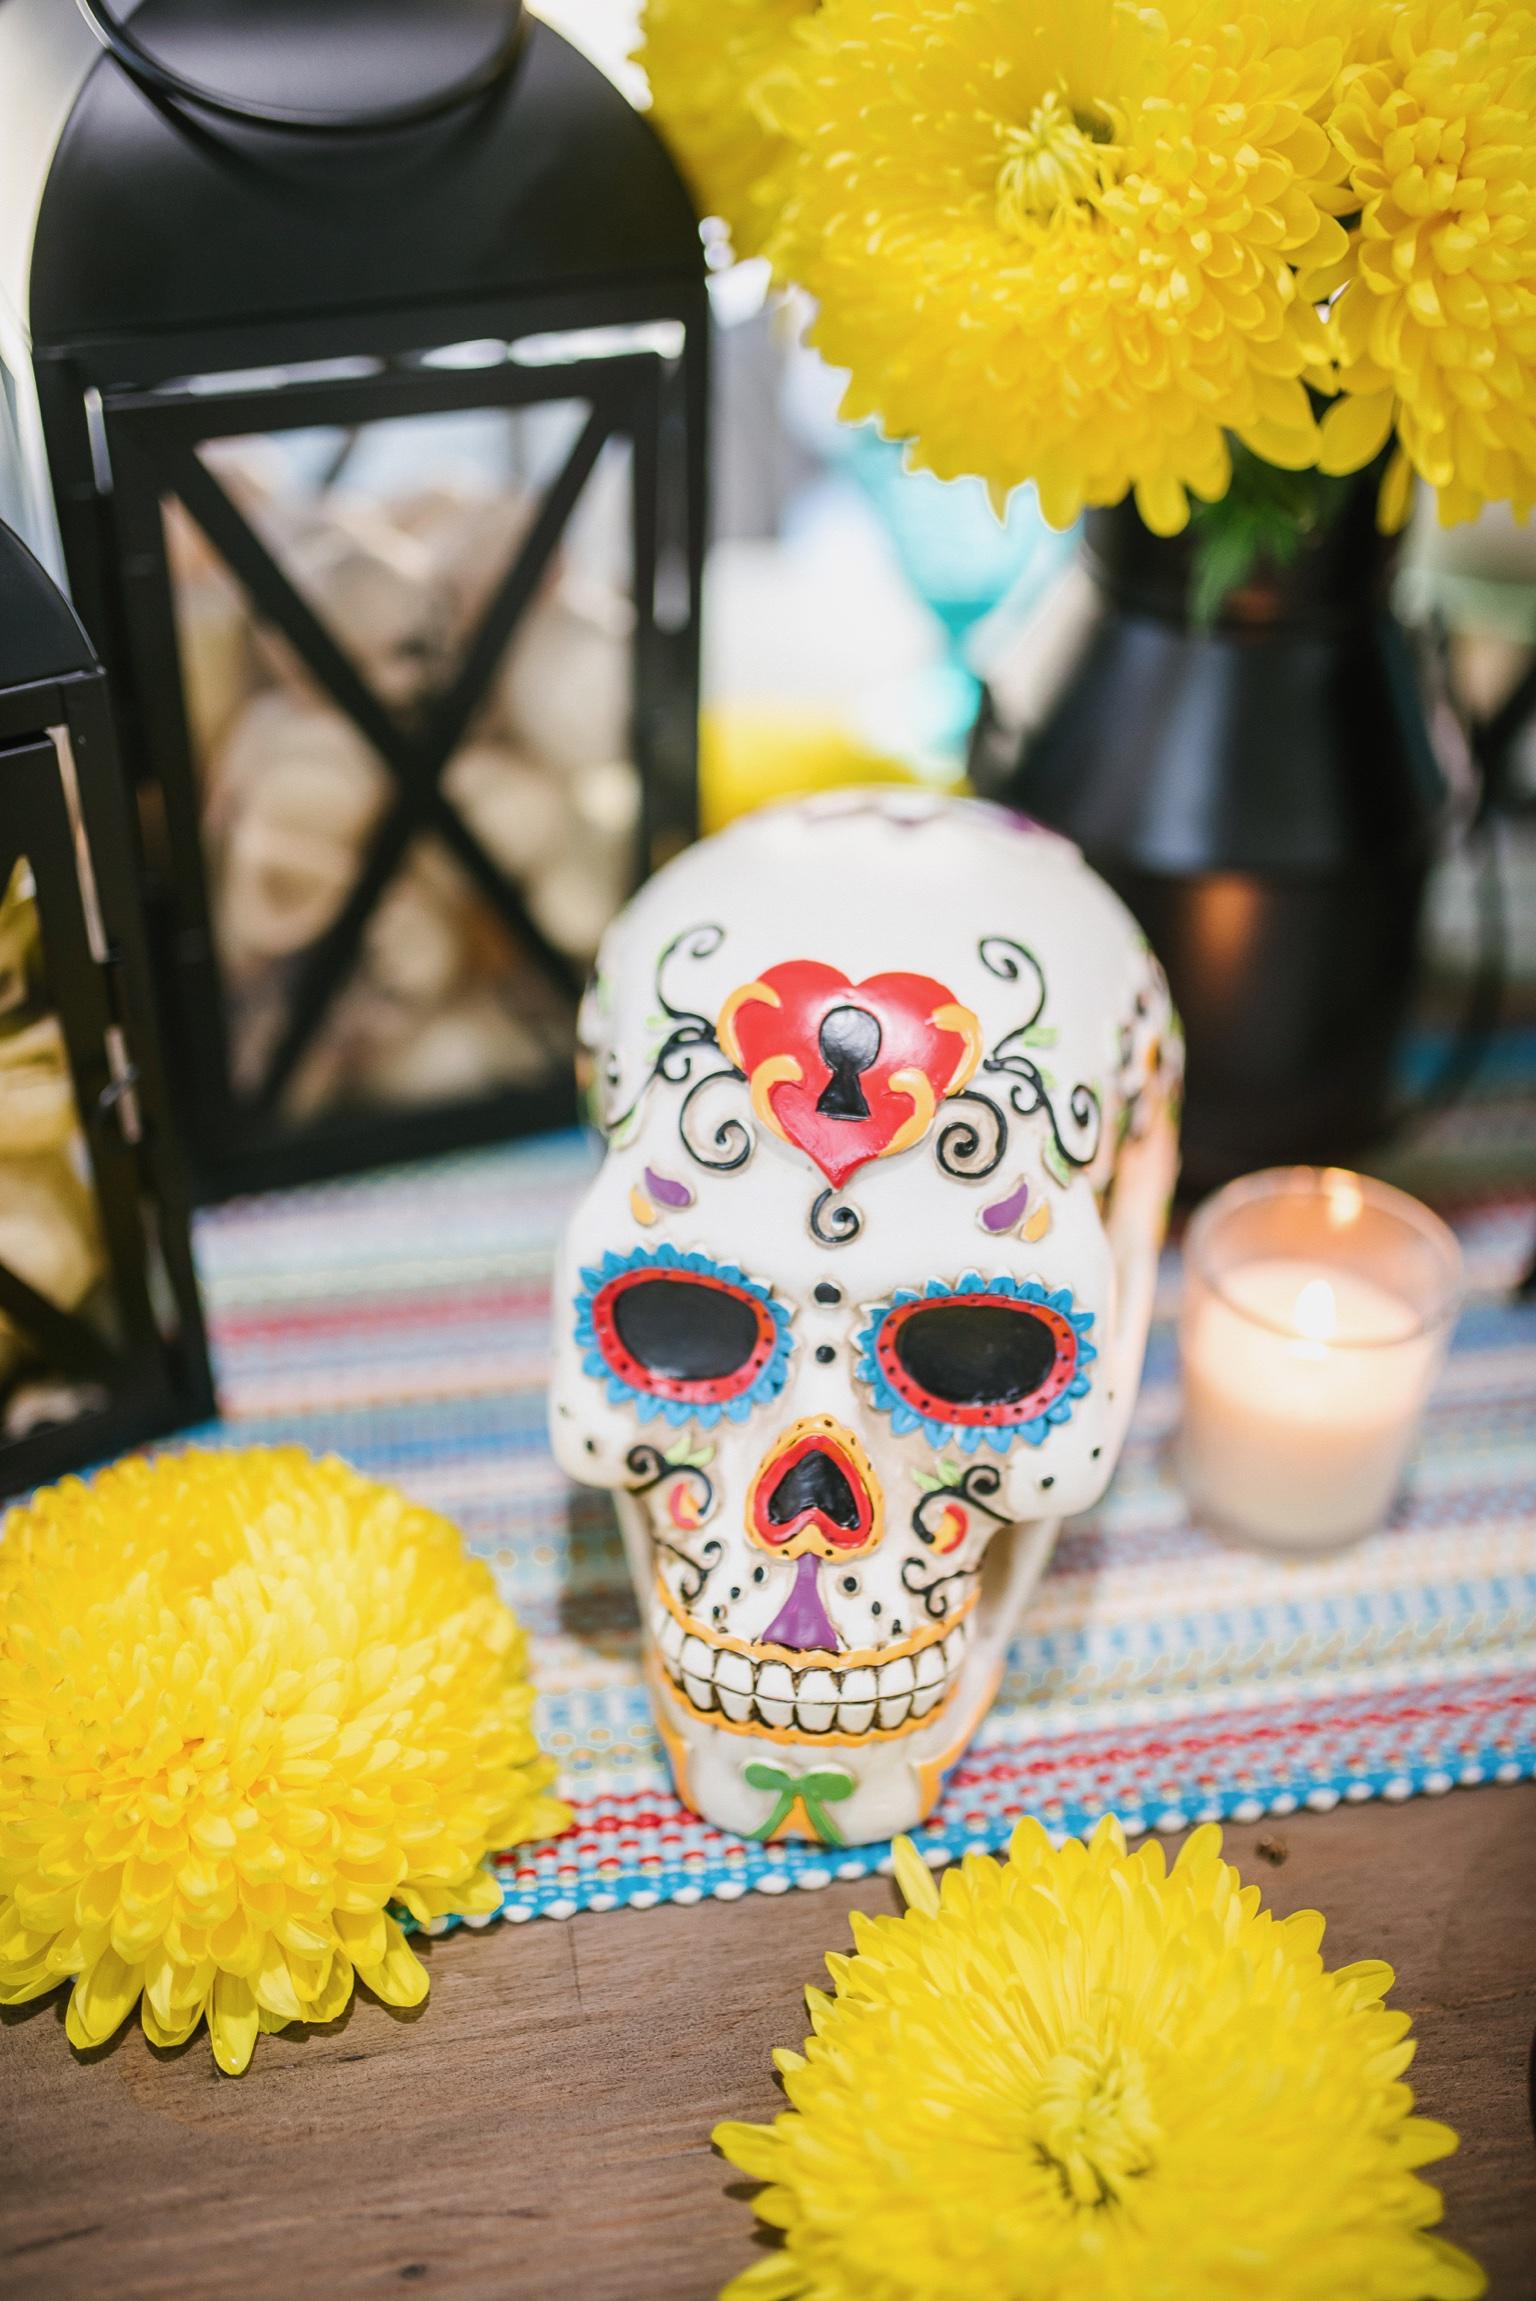 Houston top fashion blogger, LuxMommy, celebrates dia de los muertos